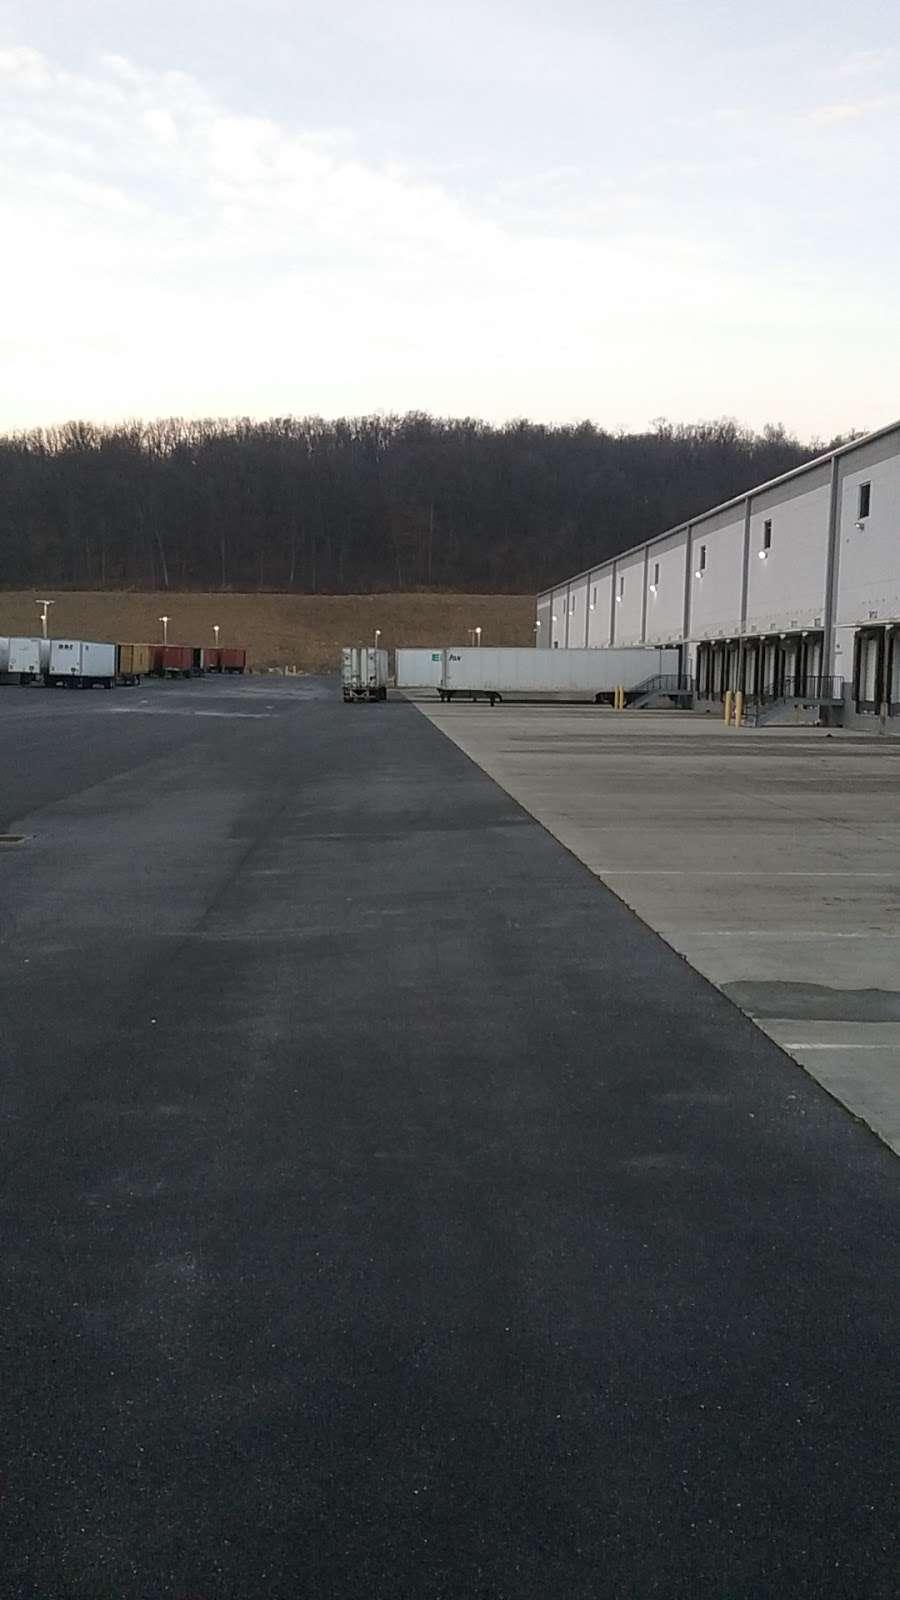 Samsung Distribution Center - storage  | Photo 2 of 3 | Address: 41 Martha Dr, Bethel, PA 19507, USA | Phone: (214) 959-5969